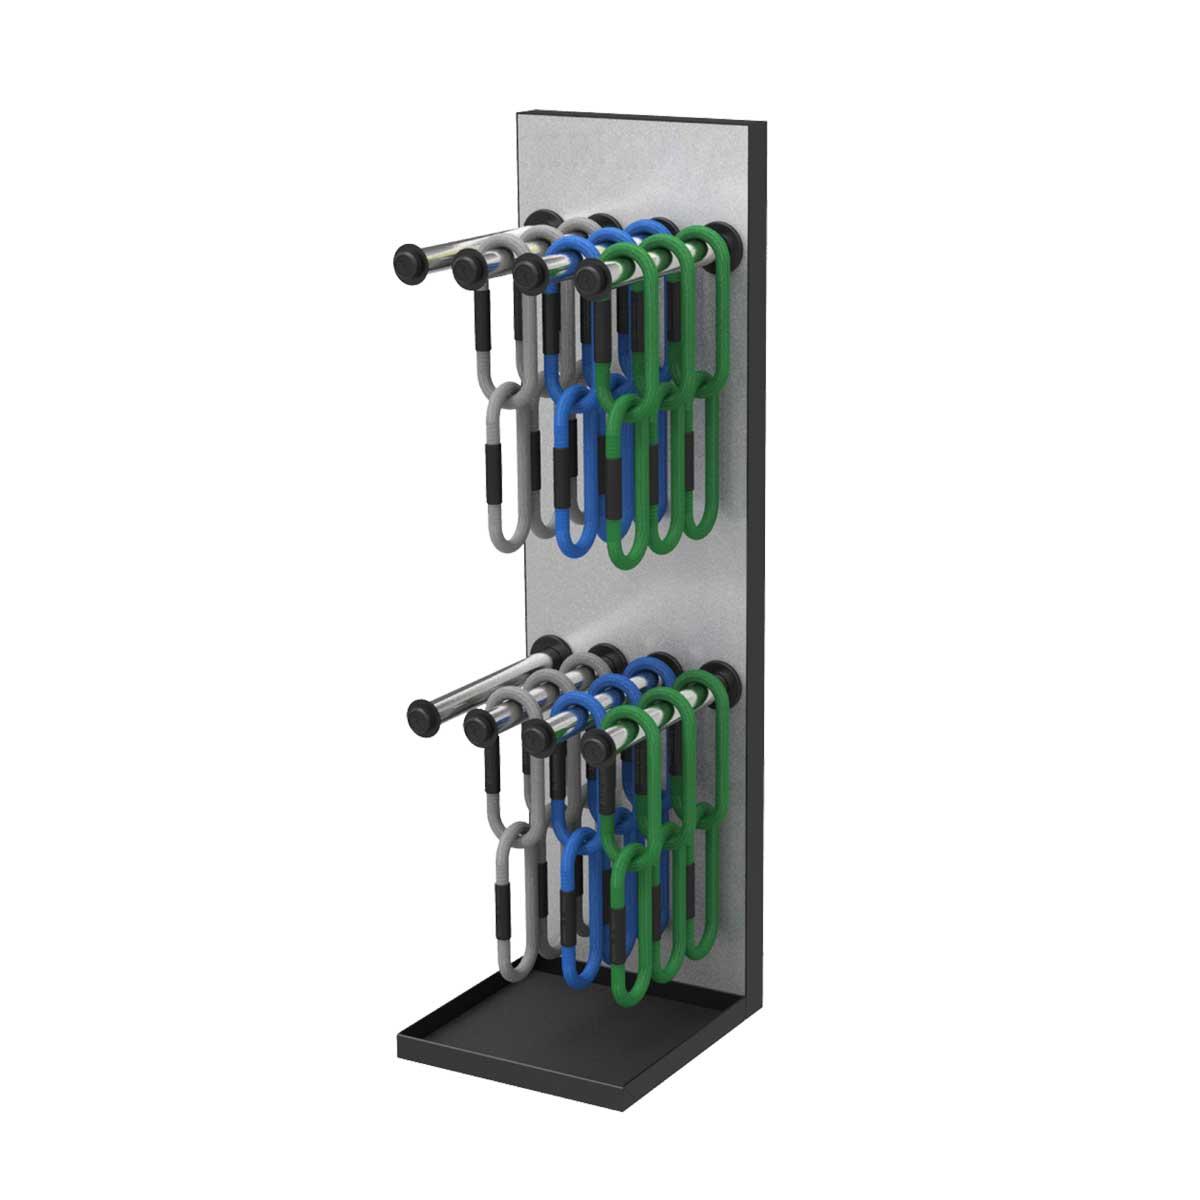 Reax Chain Two Display Storage